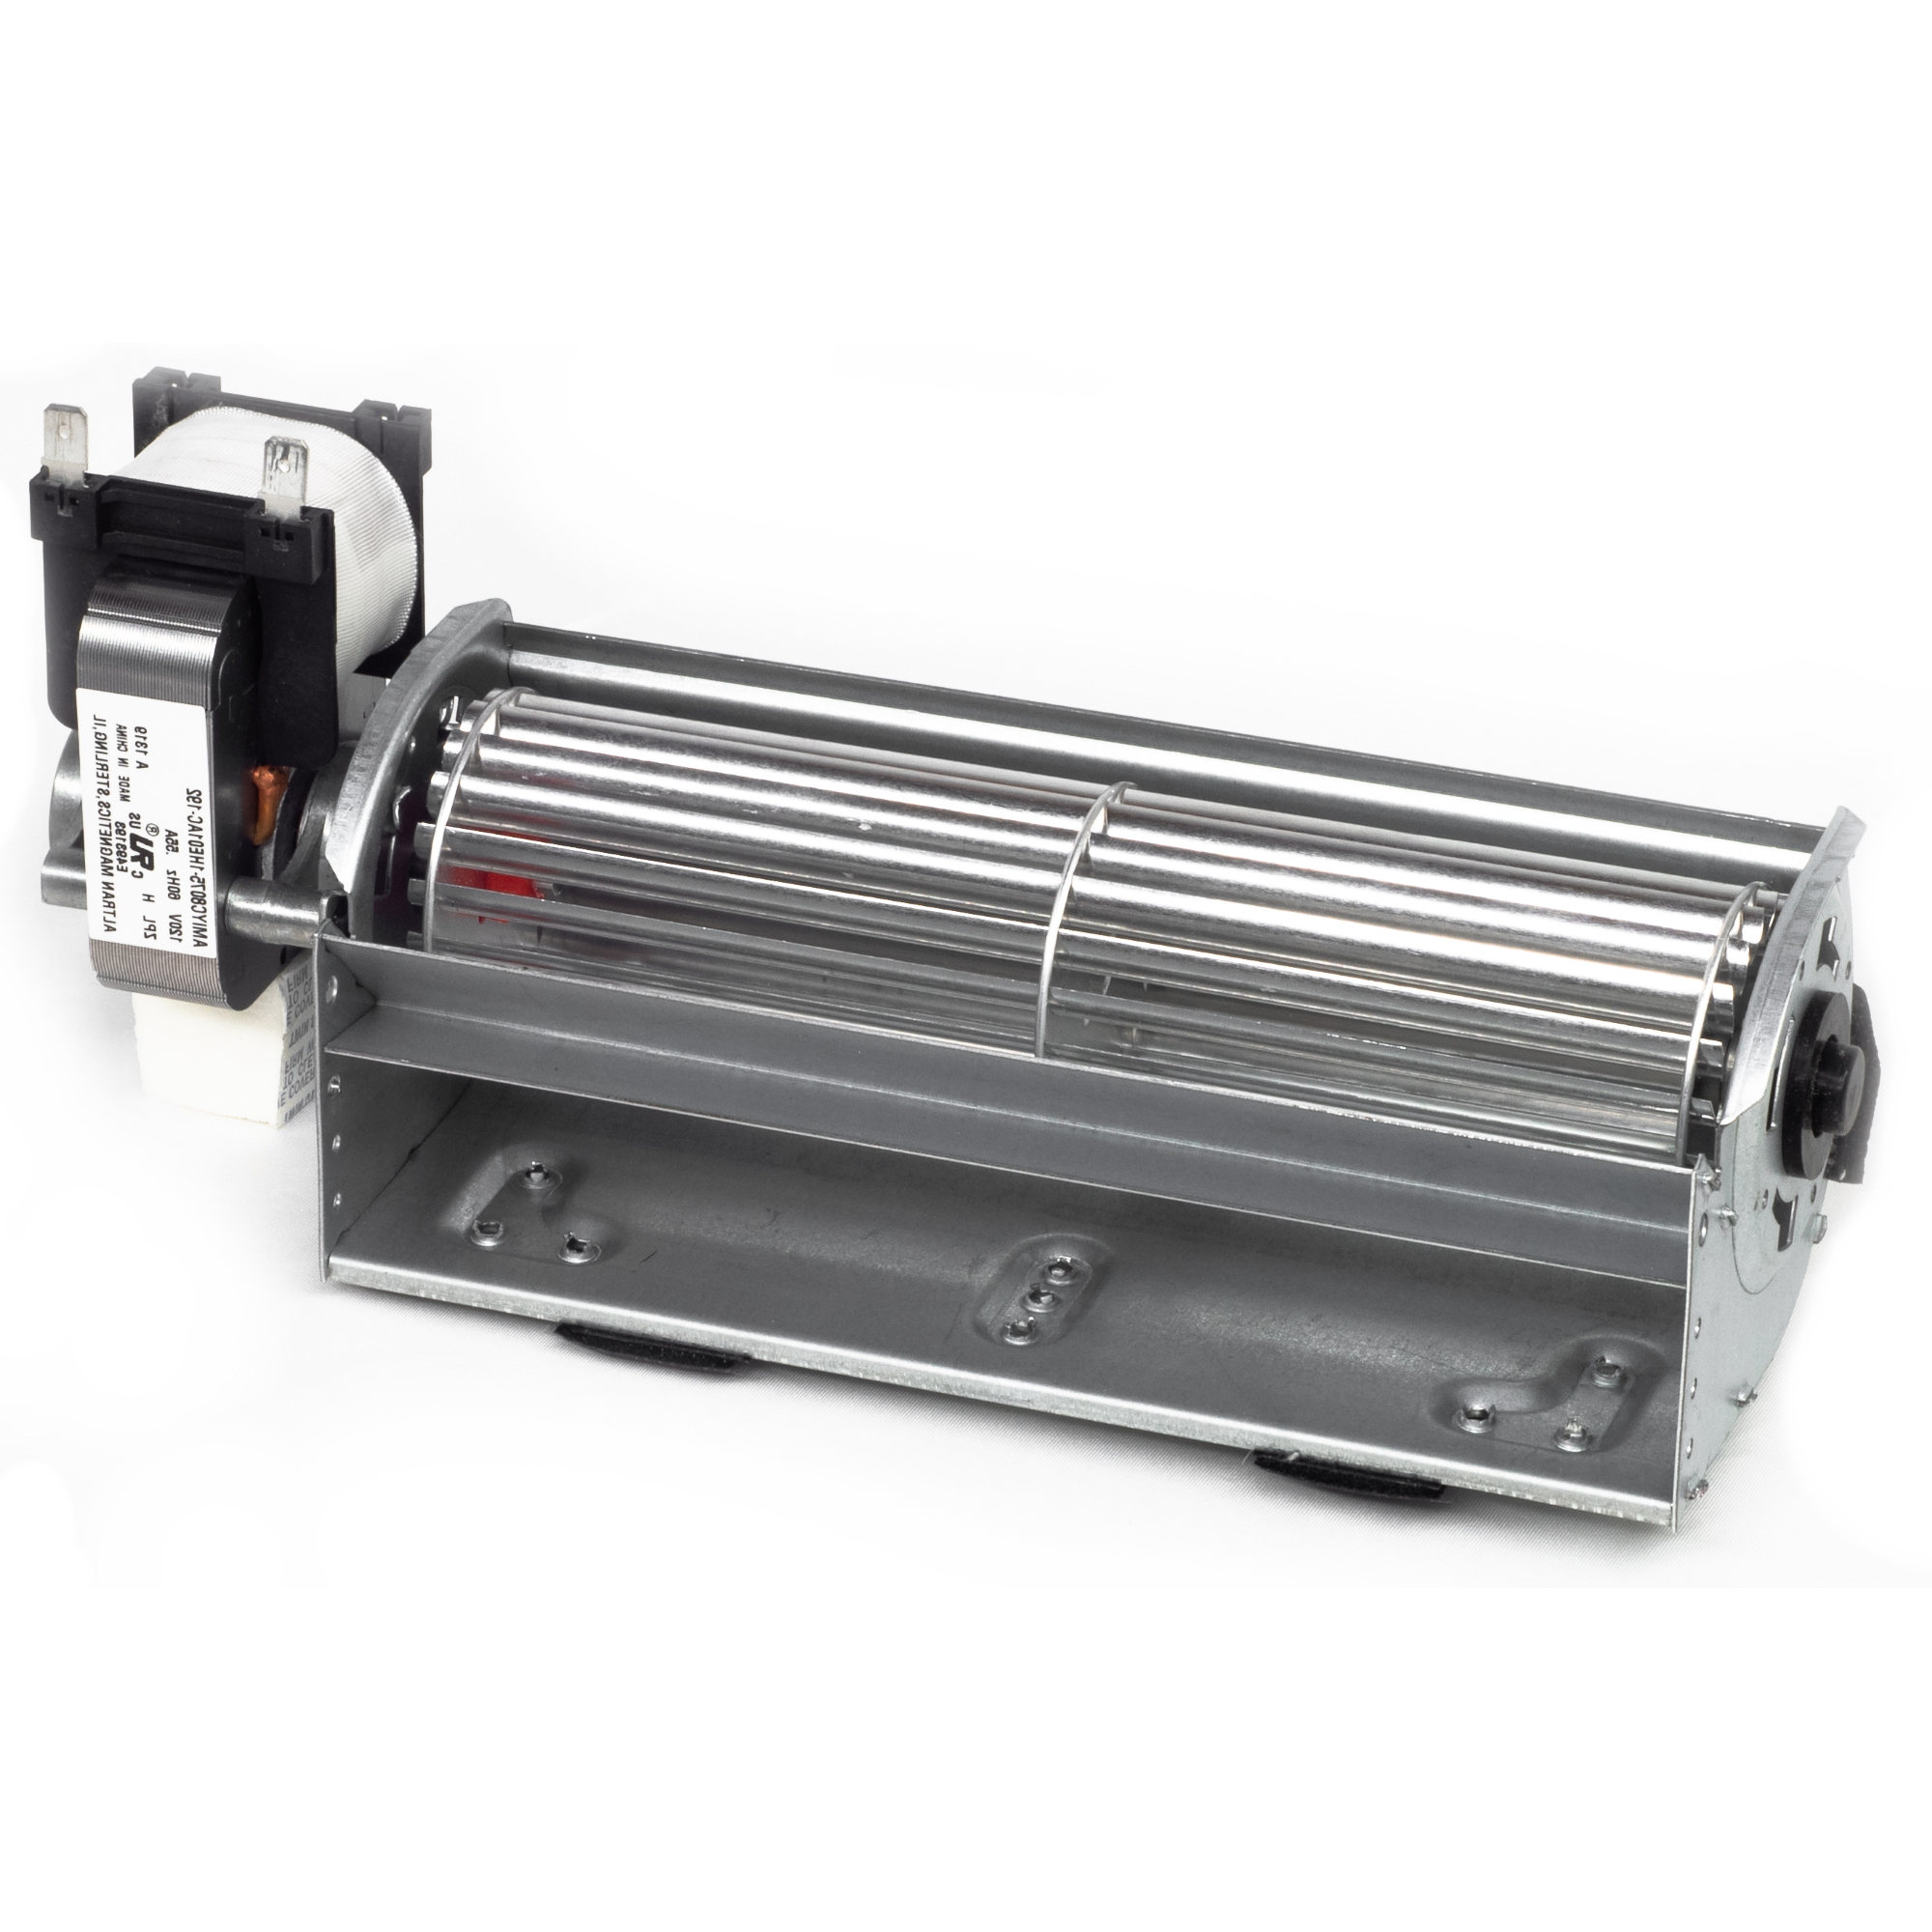 600-097L Aftermarket Kozy Heat Replacement Blower | Left Side